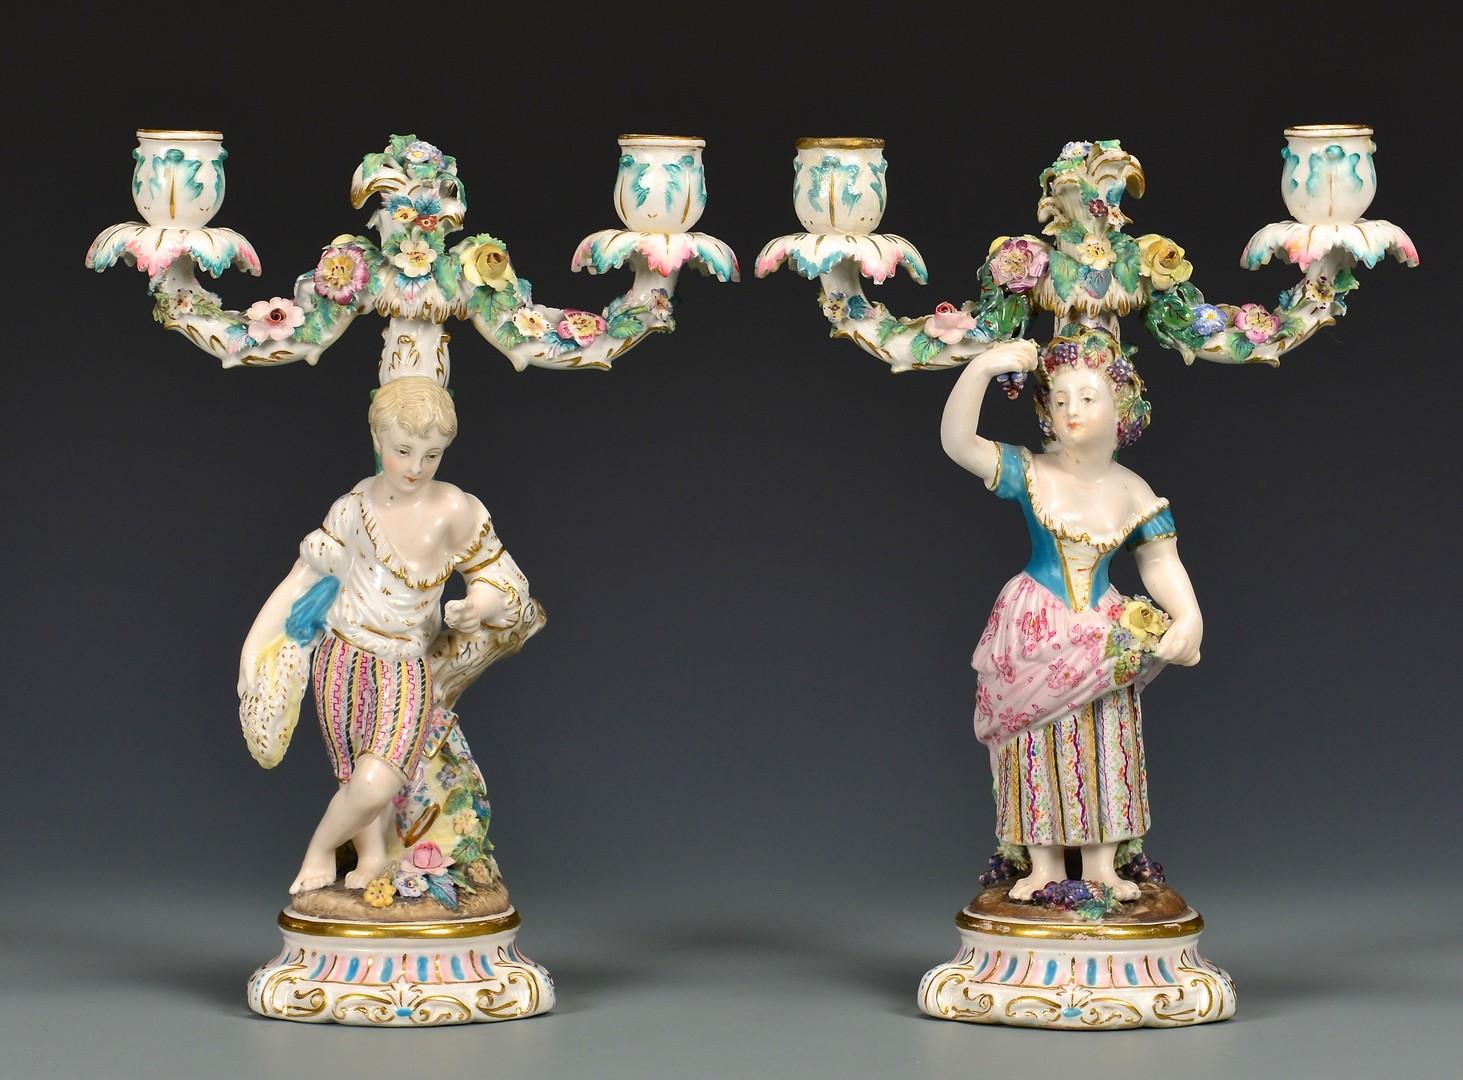 Lot 4010228: Pr. German Figural Candelabra & European Lamps